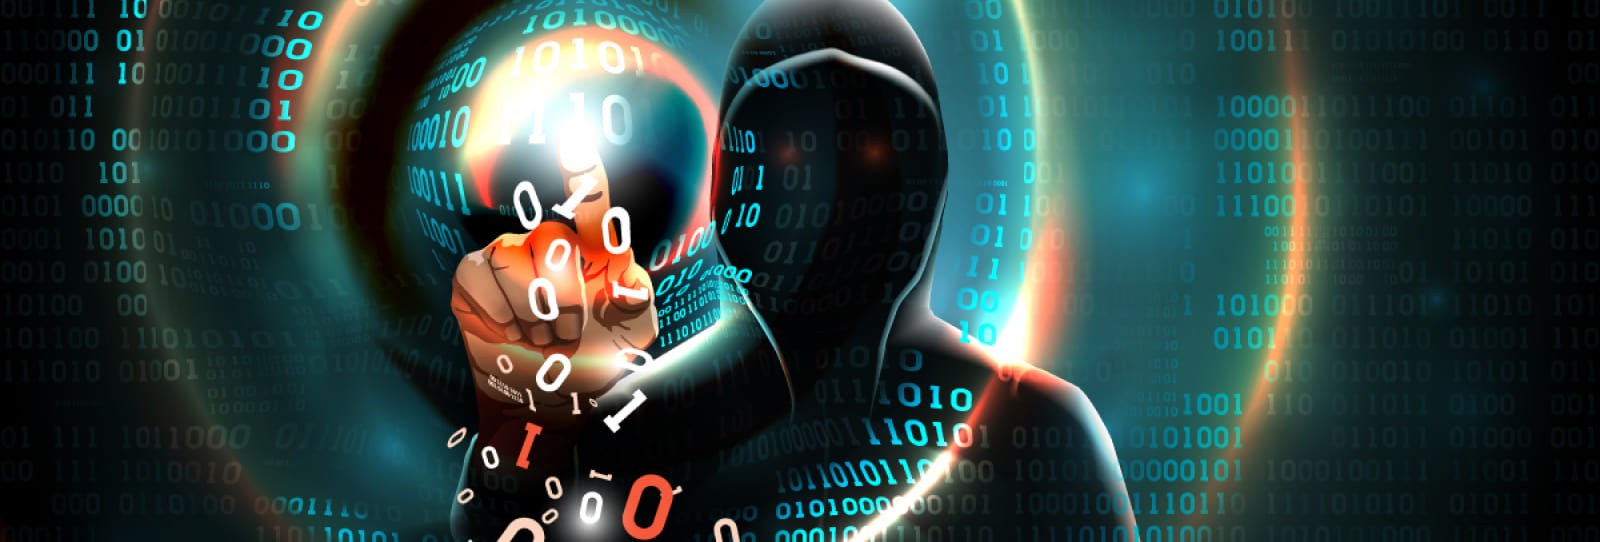 Cyberhunt - Advanced Threat Hunting & Analysis